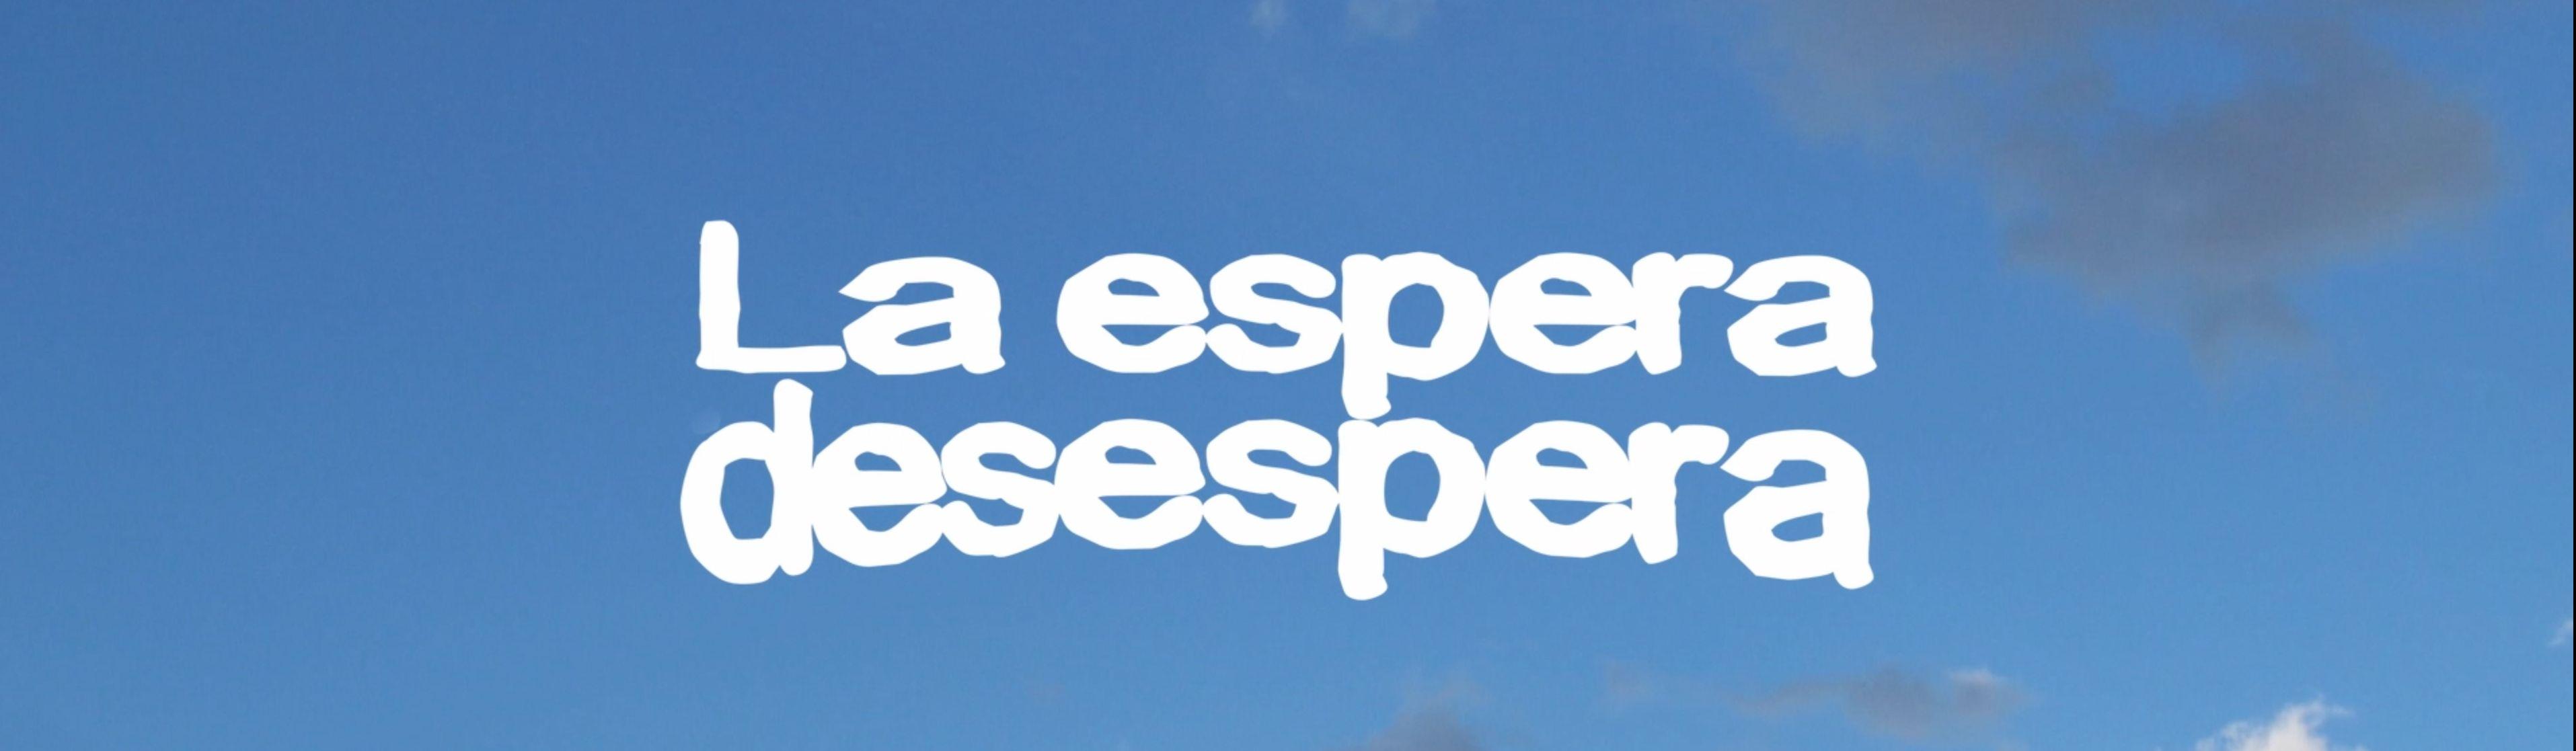 HOPEFUL HOPELESS  / LA ESPERA DESESPERA